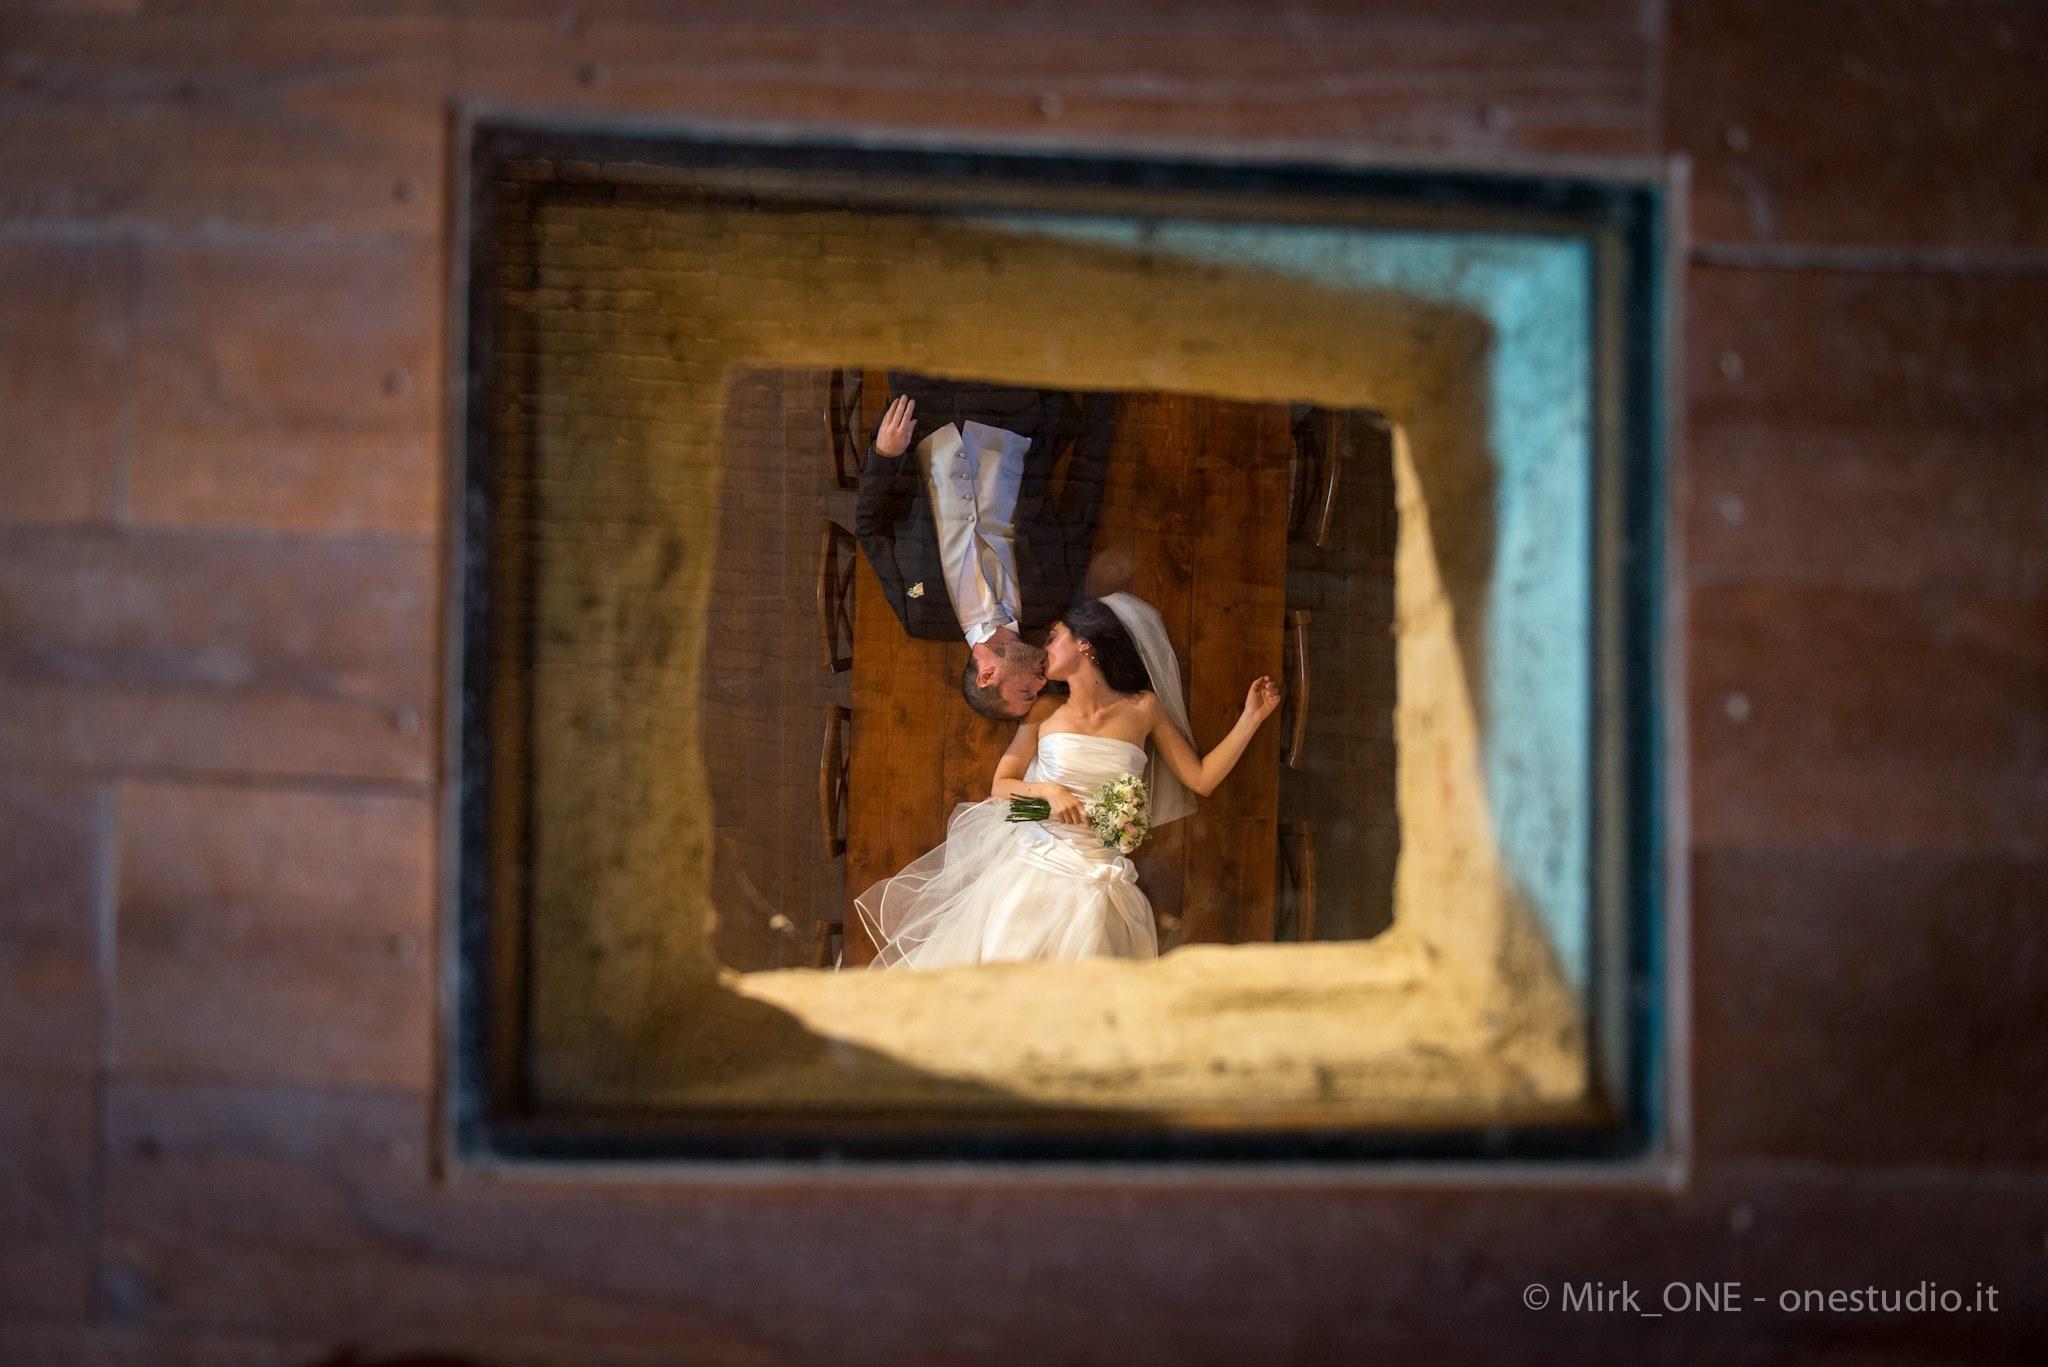 https://lnx.mirkone.it/wp-content/uploads/2015/07/mirk_ONE-fotografo-matrimonio-00835.jpg